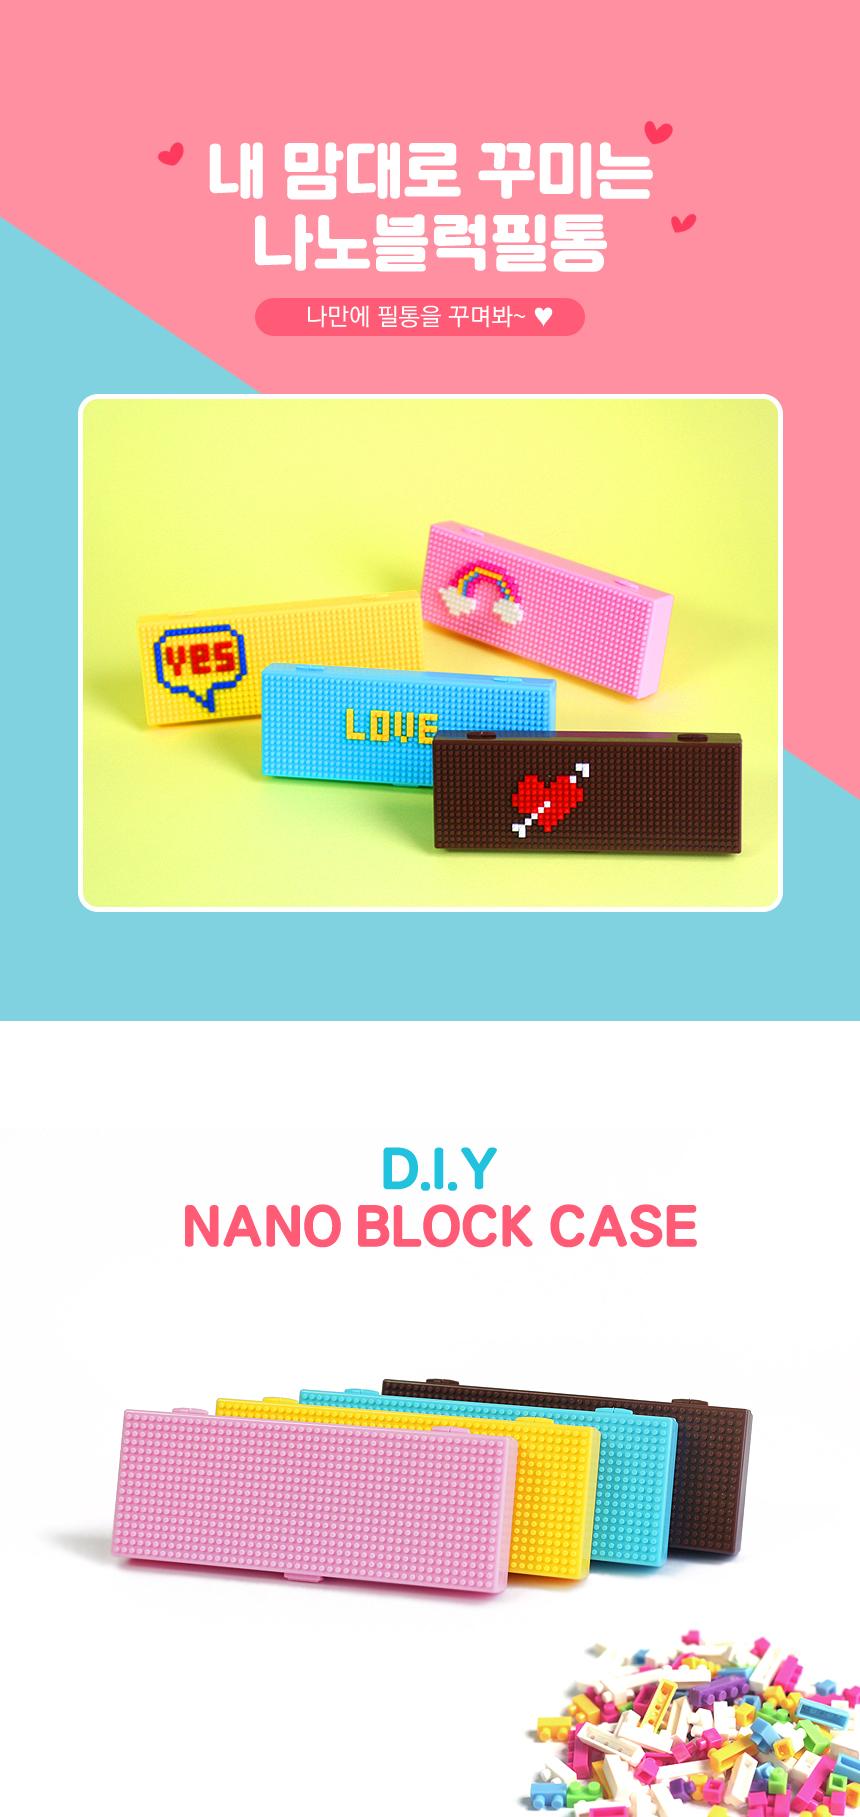 nanoblock_case01.jpg